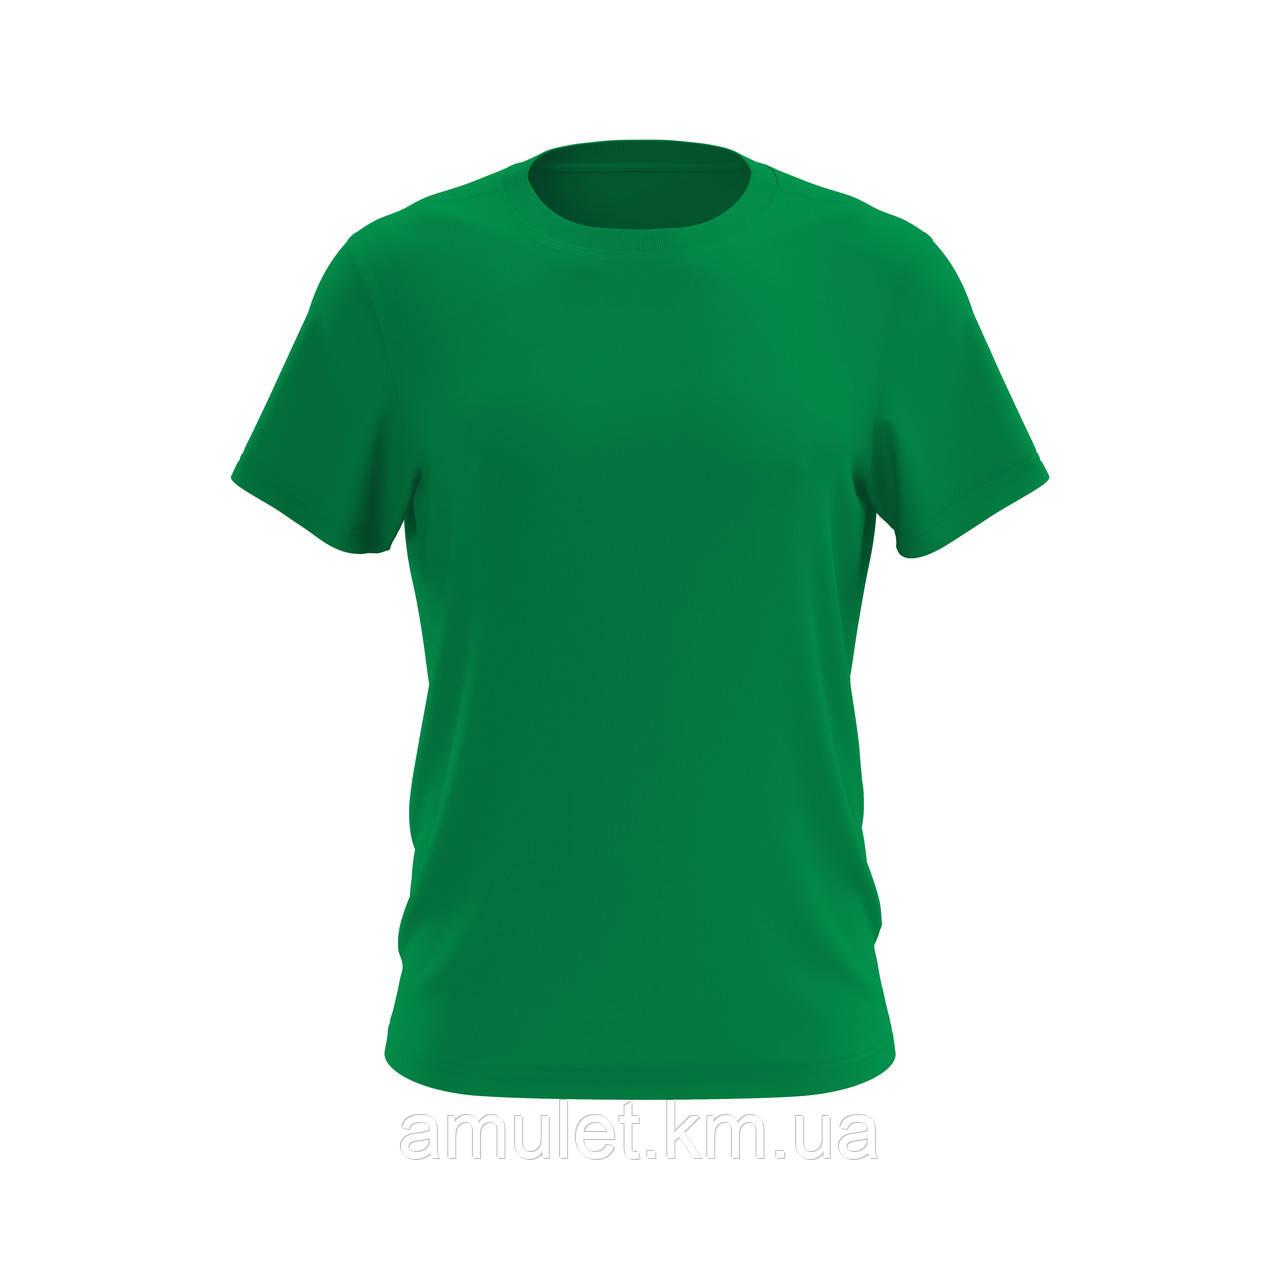 Футболка чоловіча Premium зелена